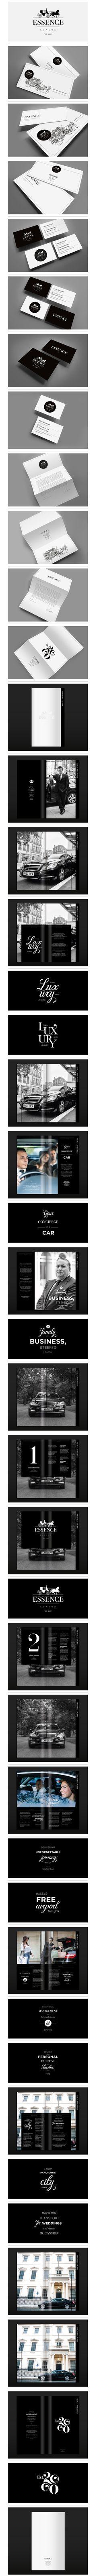 Essence London, Branding, Monotone, Editorial, Magazine, Photography